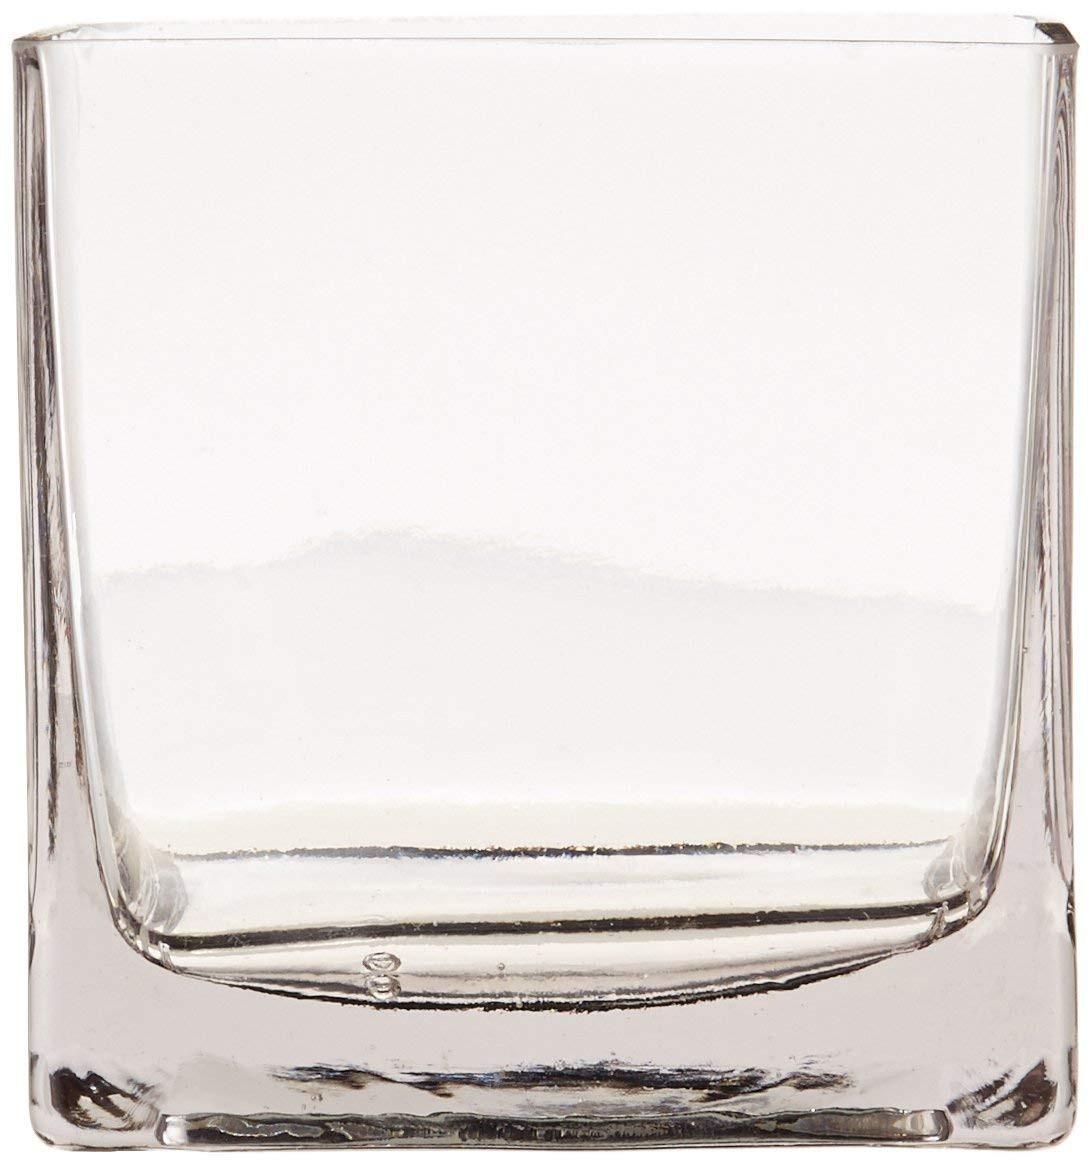 plastic cylinder vases bulk of amazon com 12piece 4 square crystal clear glass vase home kitchen with 61odrrfbtgl sl1164